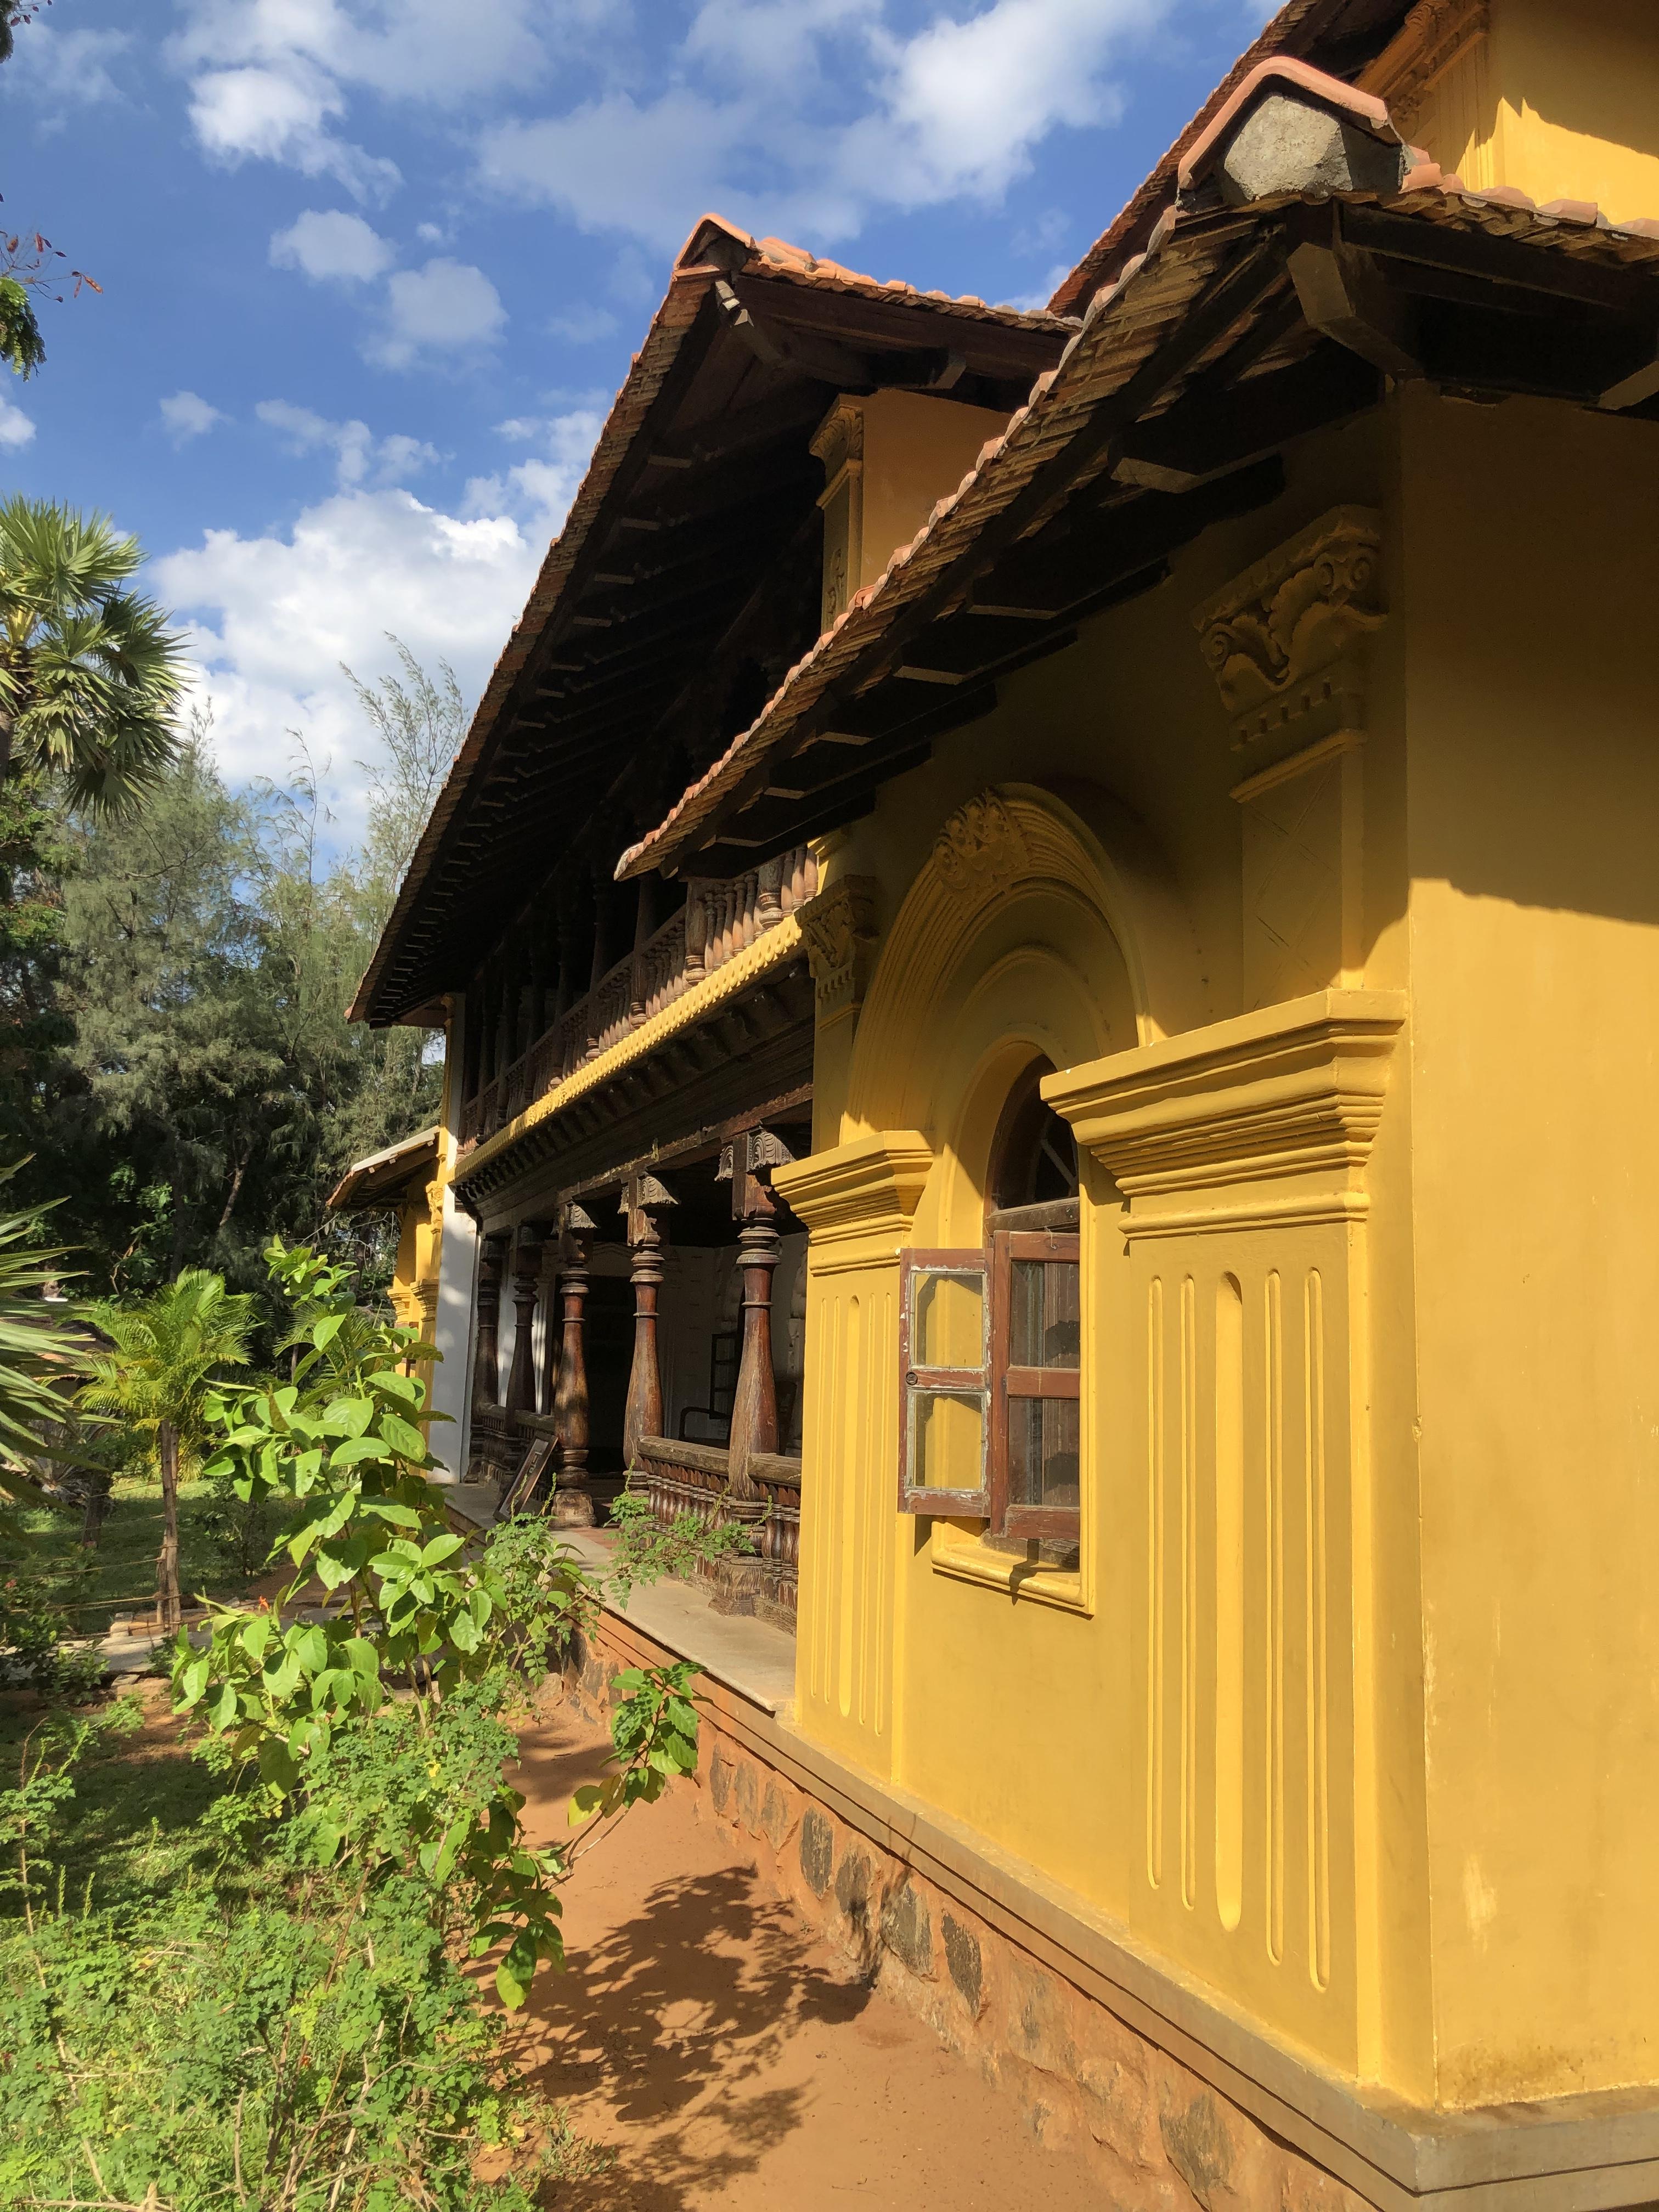 Kuestenhaus aus Andhra Pradesh